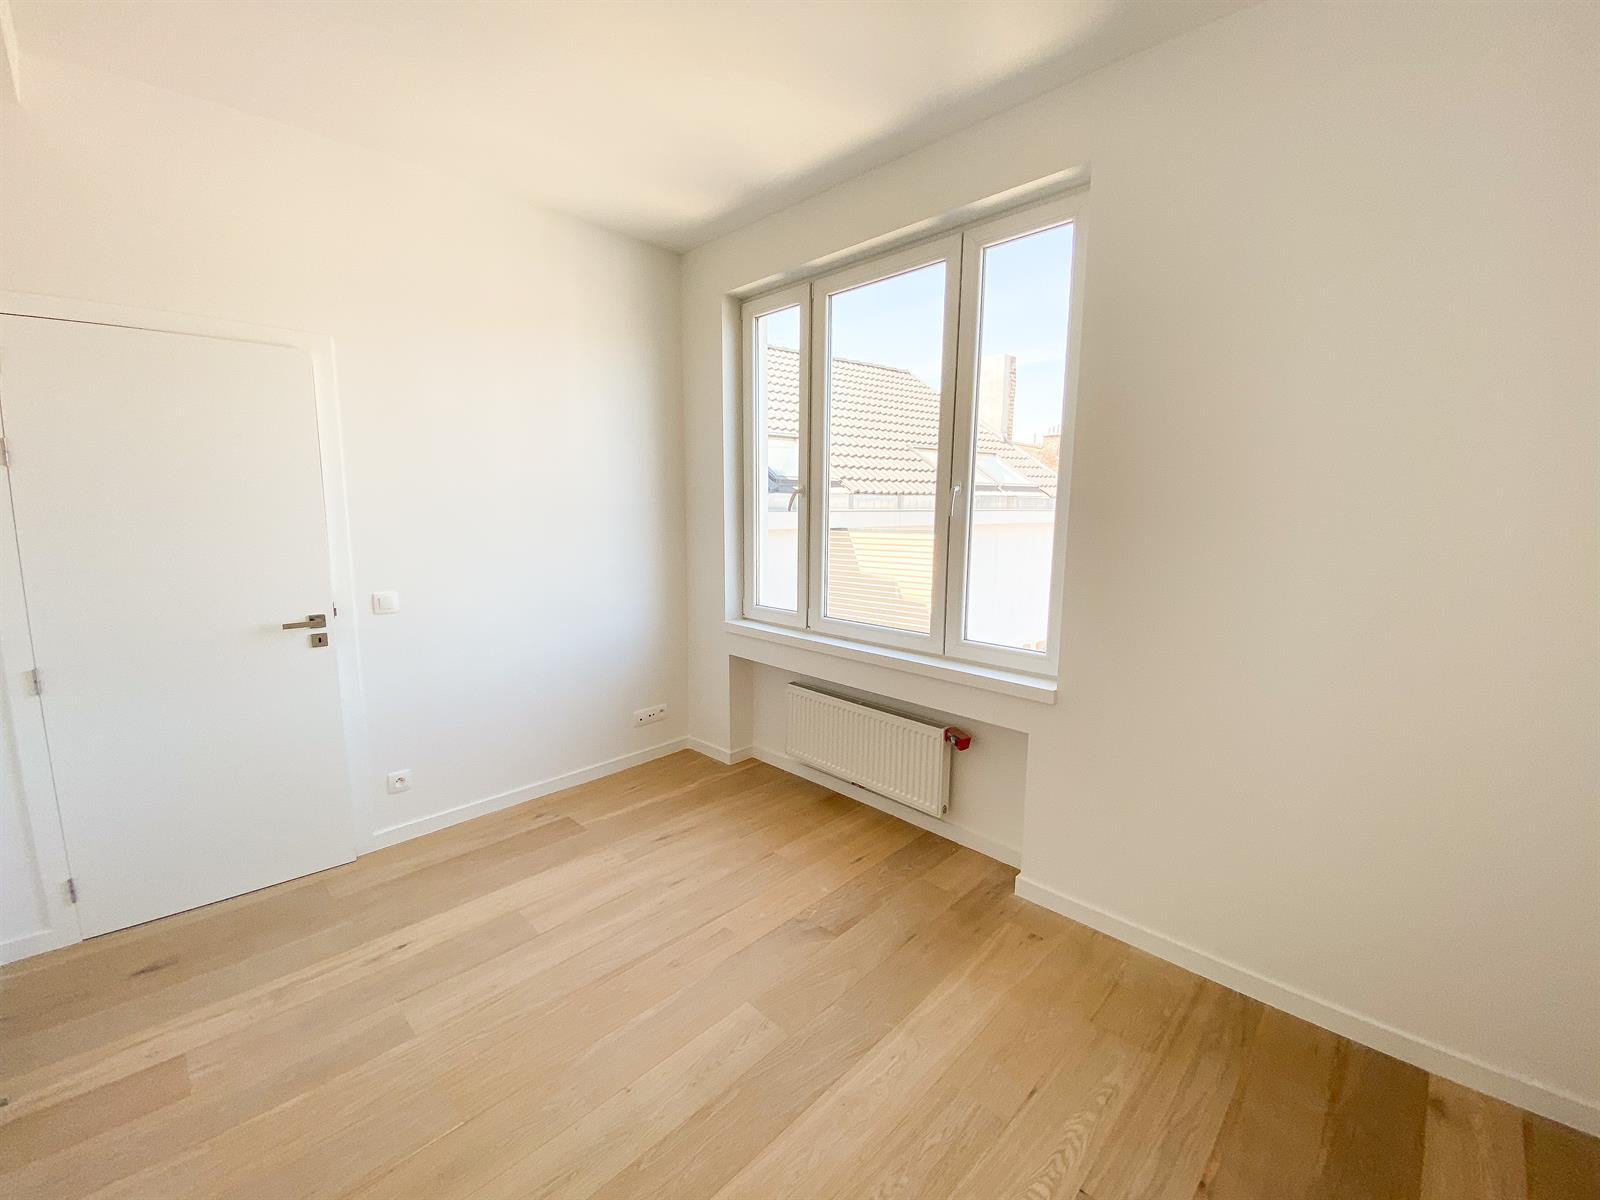 Appartement - Liège - #4045833-5